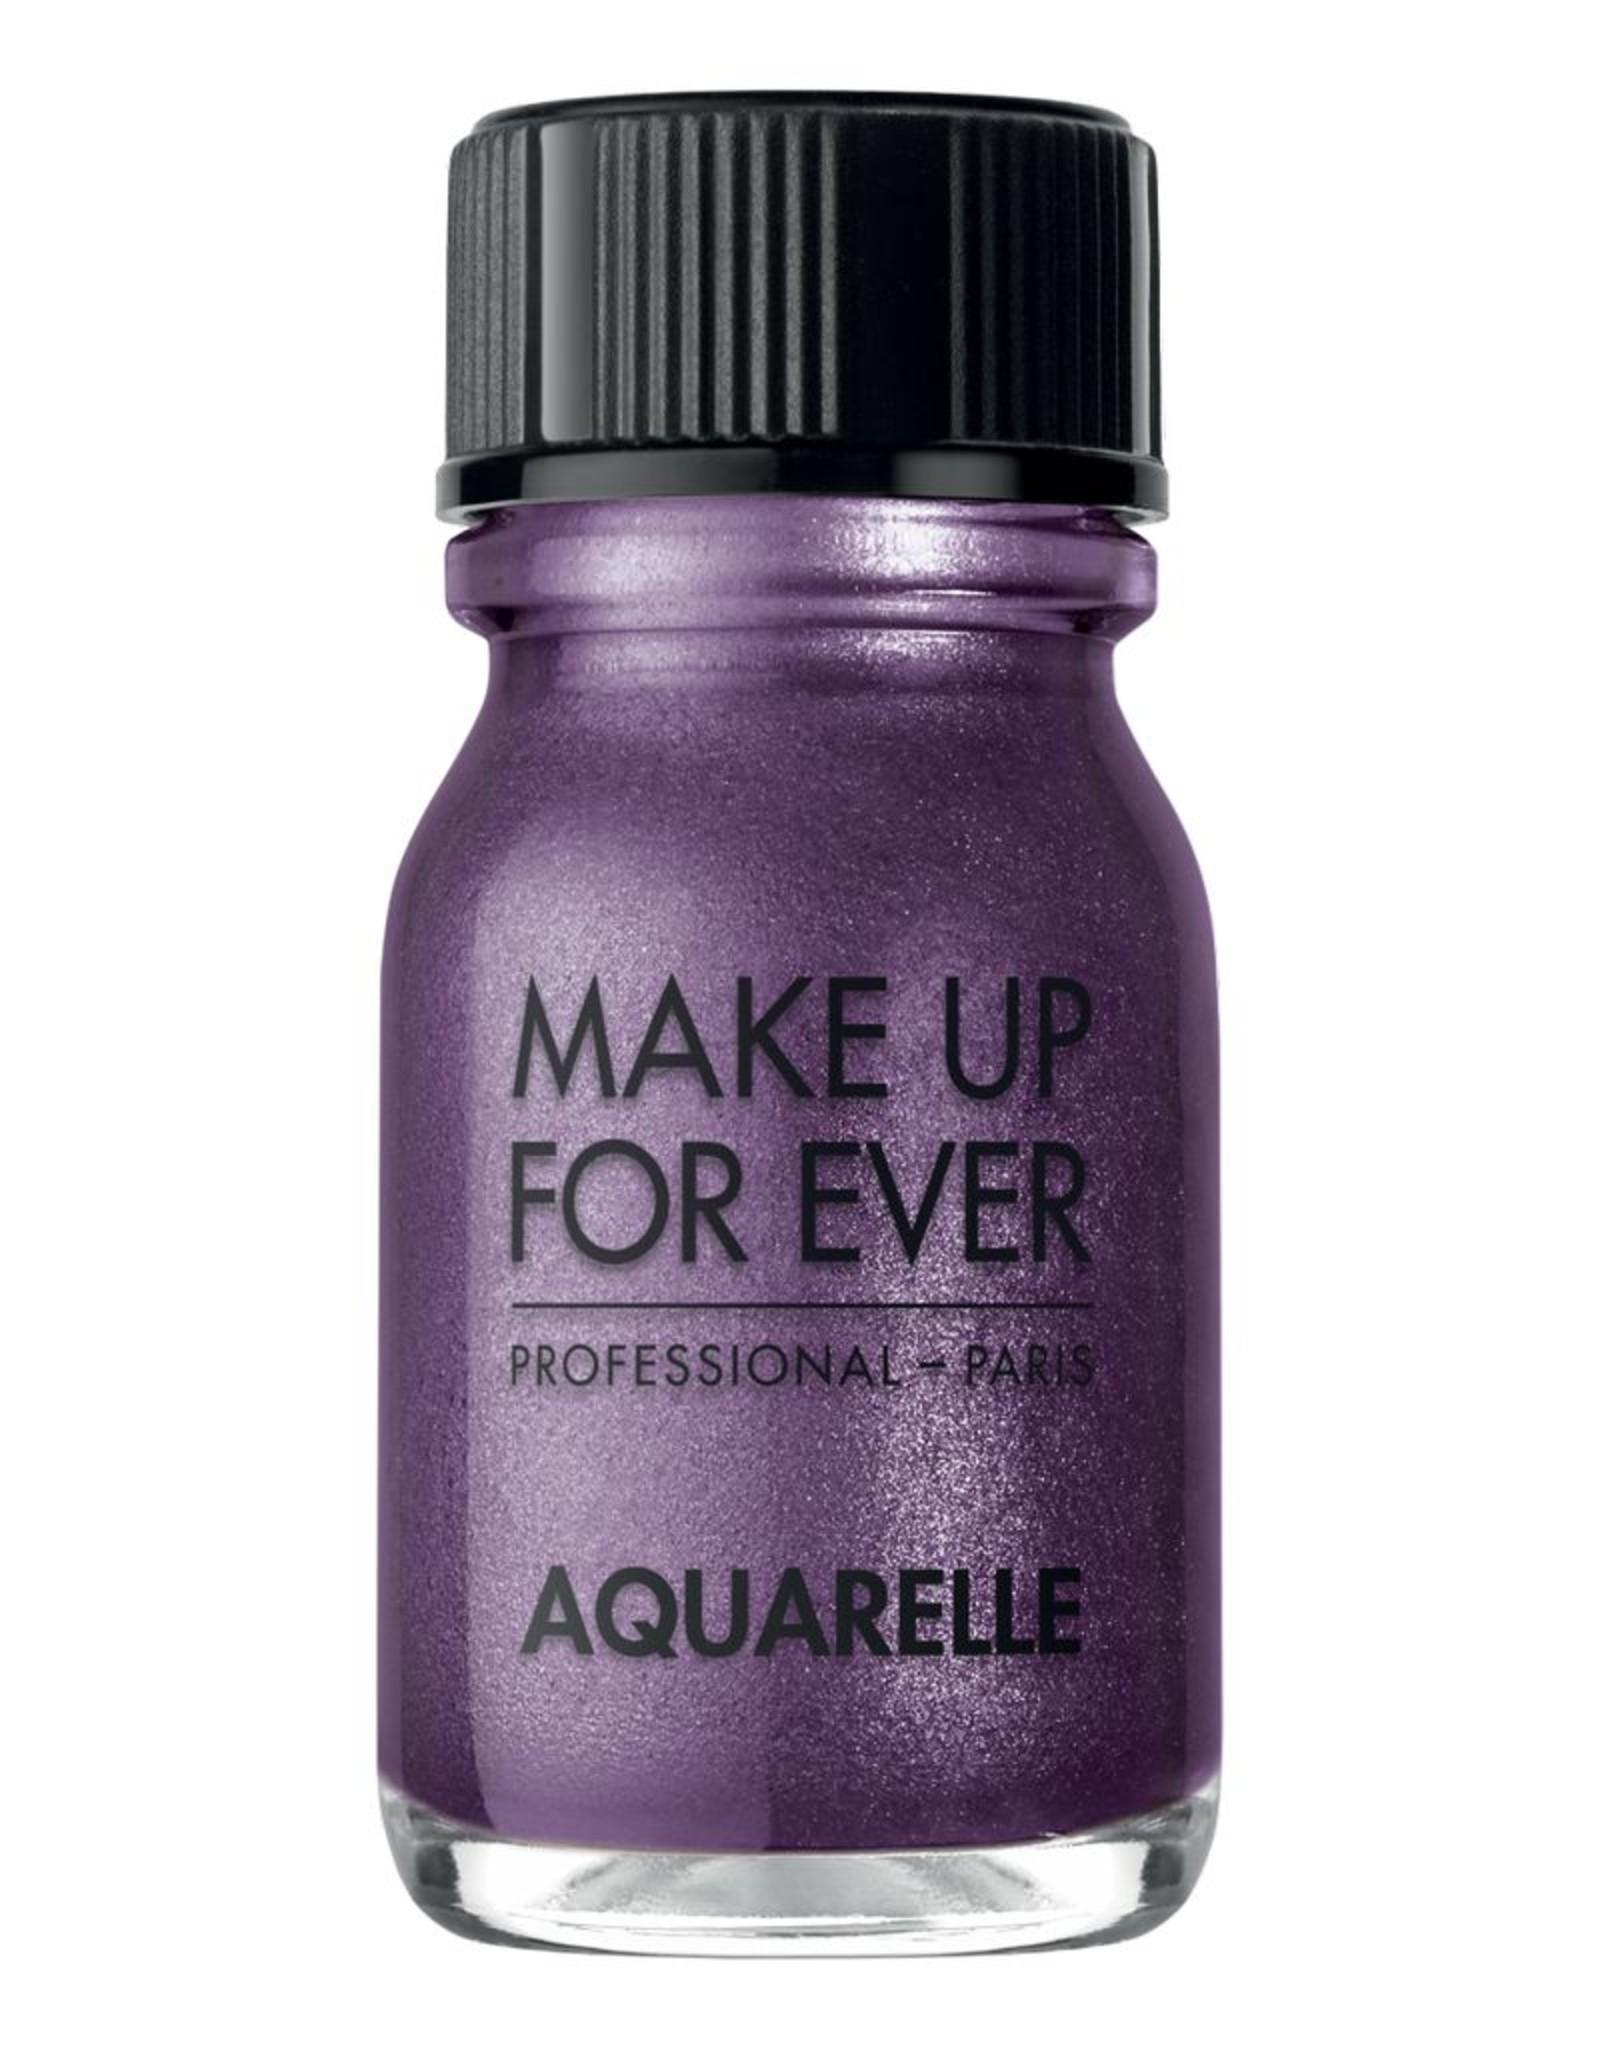 MUFE AQUARELLE 10ml N322 violet /  purple